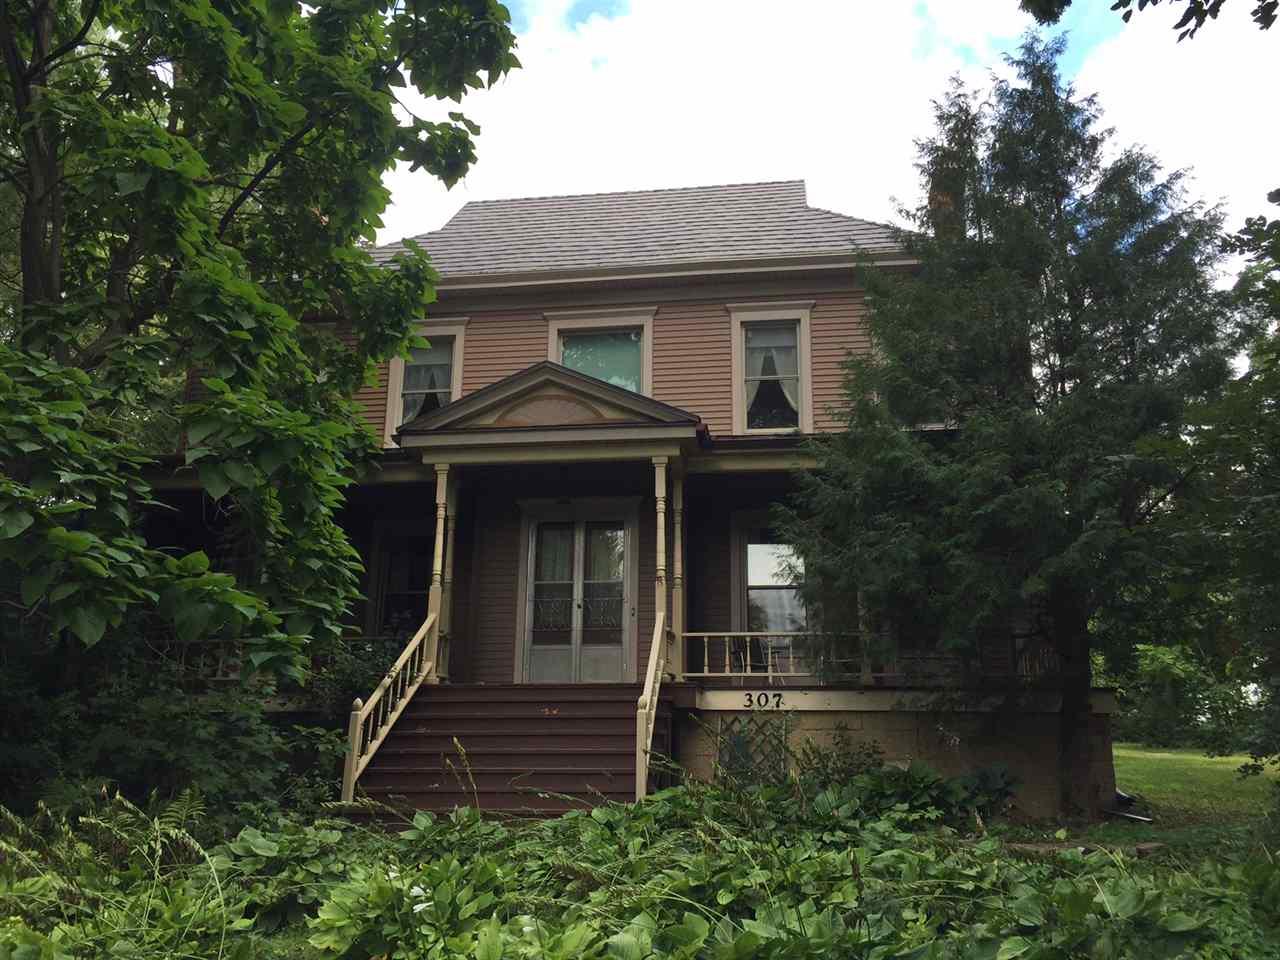 307 Washington St, Mineral Point, WI 53565